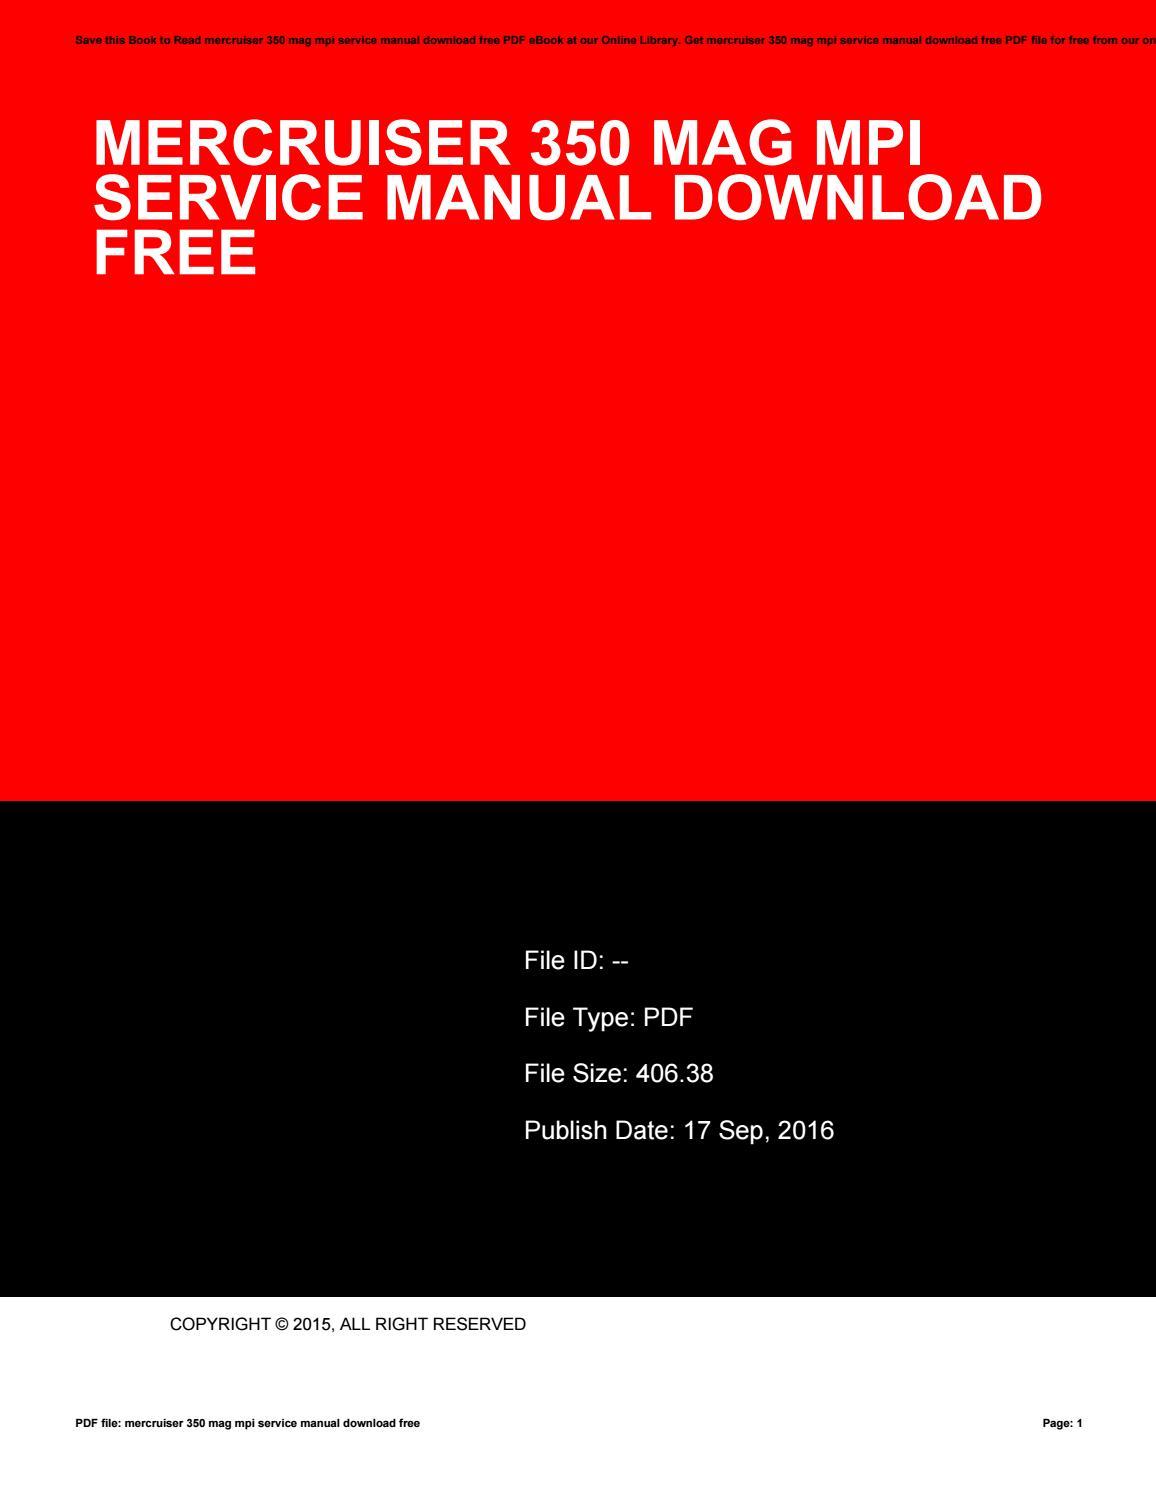 Mercruiser 350 mag mpi service manual download free by tania97kshua - issuu